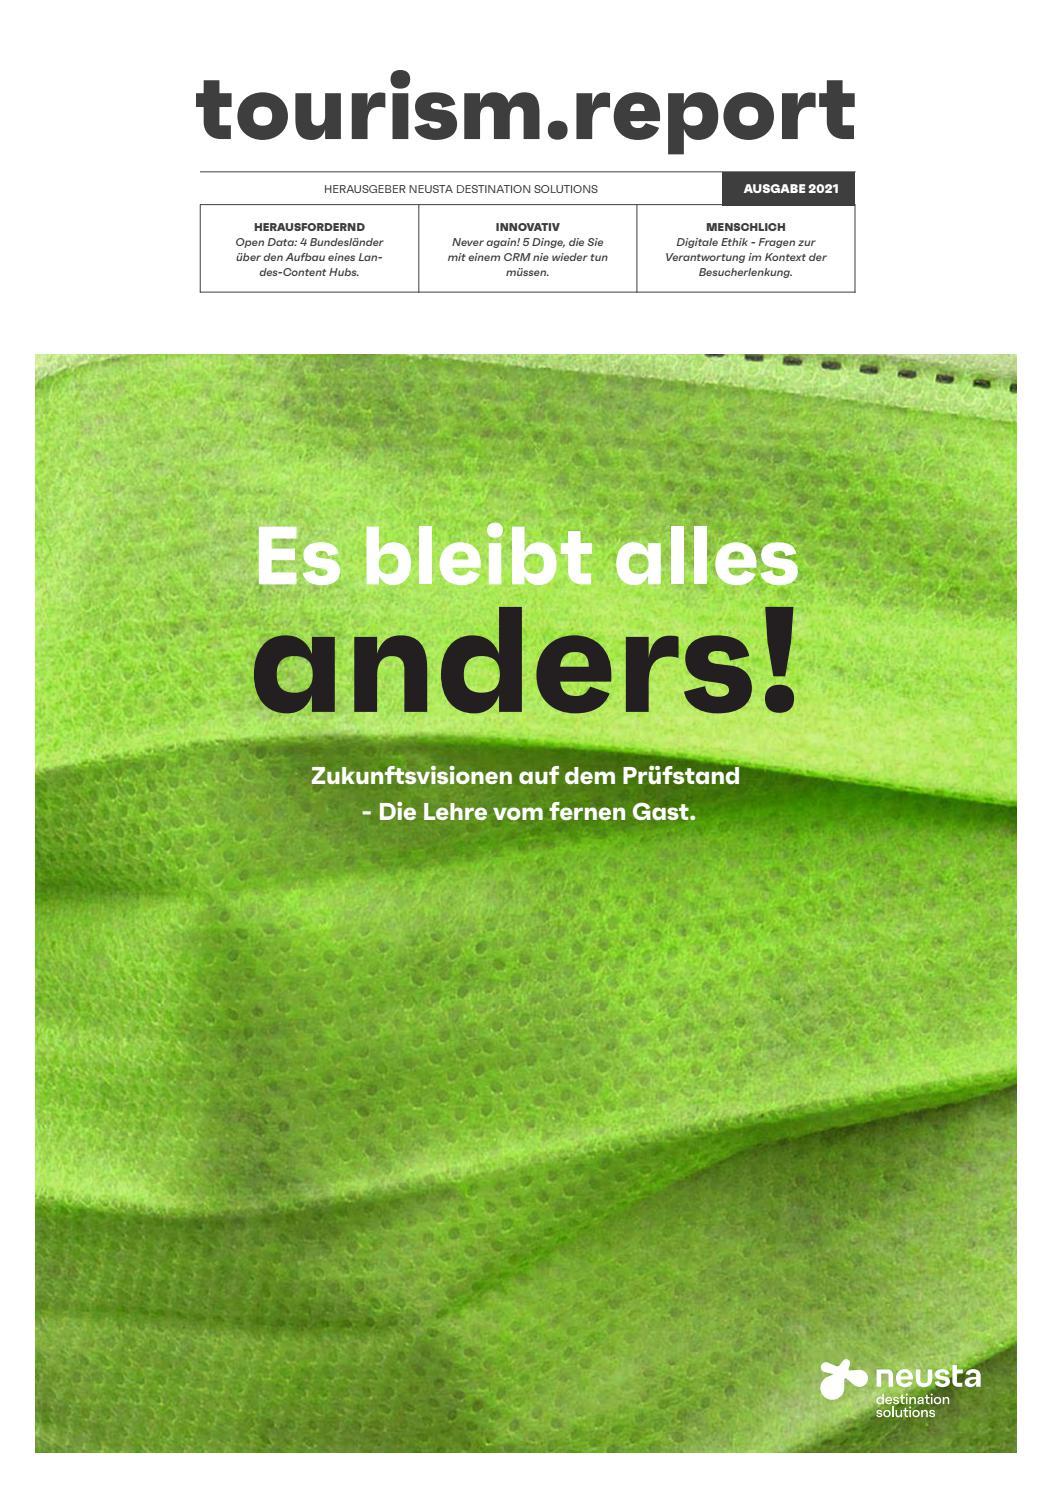 tourism.report 20 by neusta destination solutions GmbH   issuu